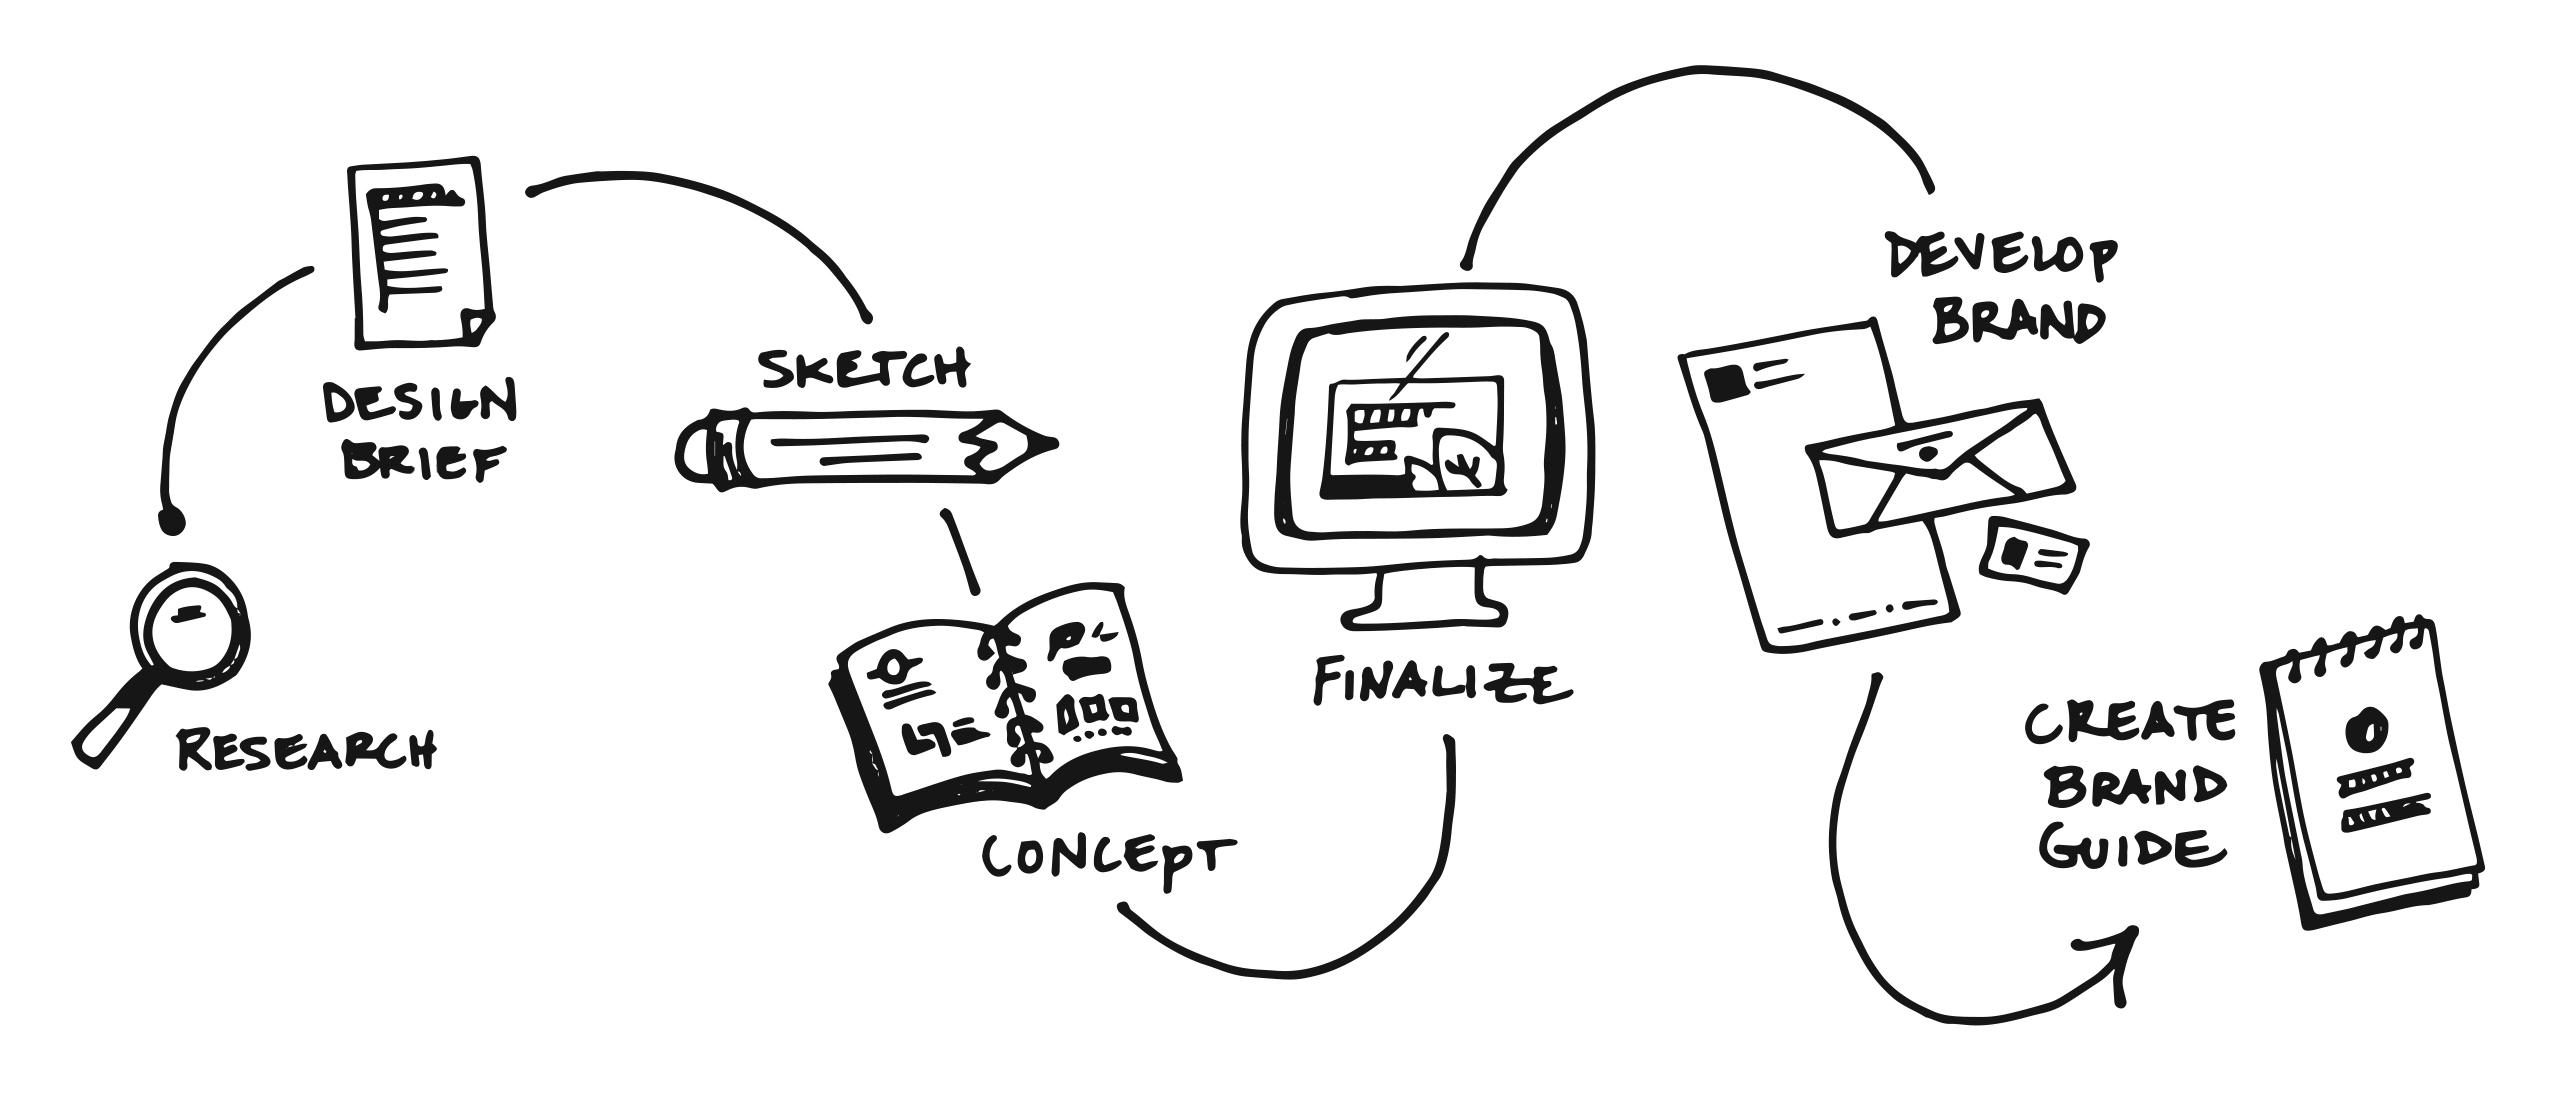 How To: Logo Design Process & Brand Guide Creation